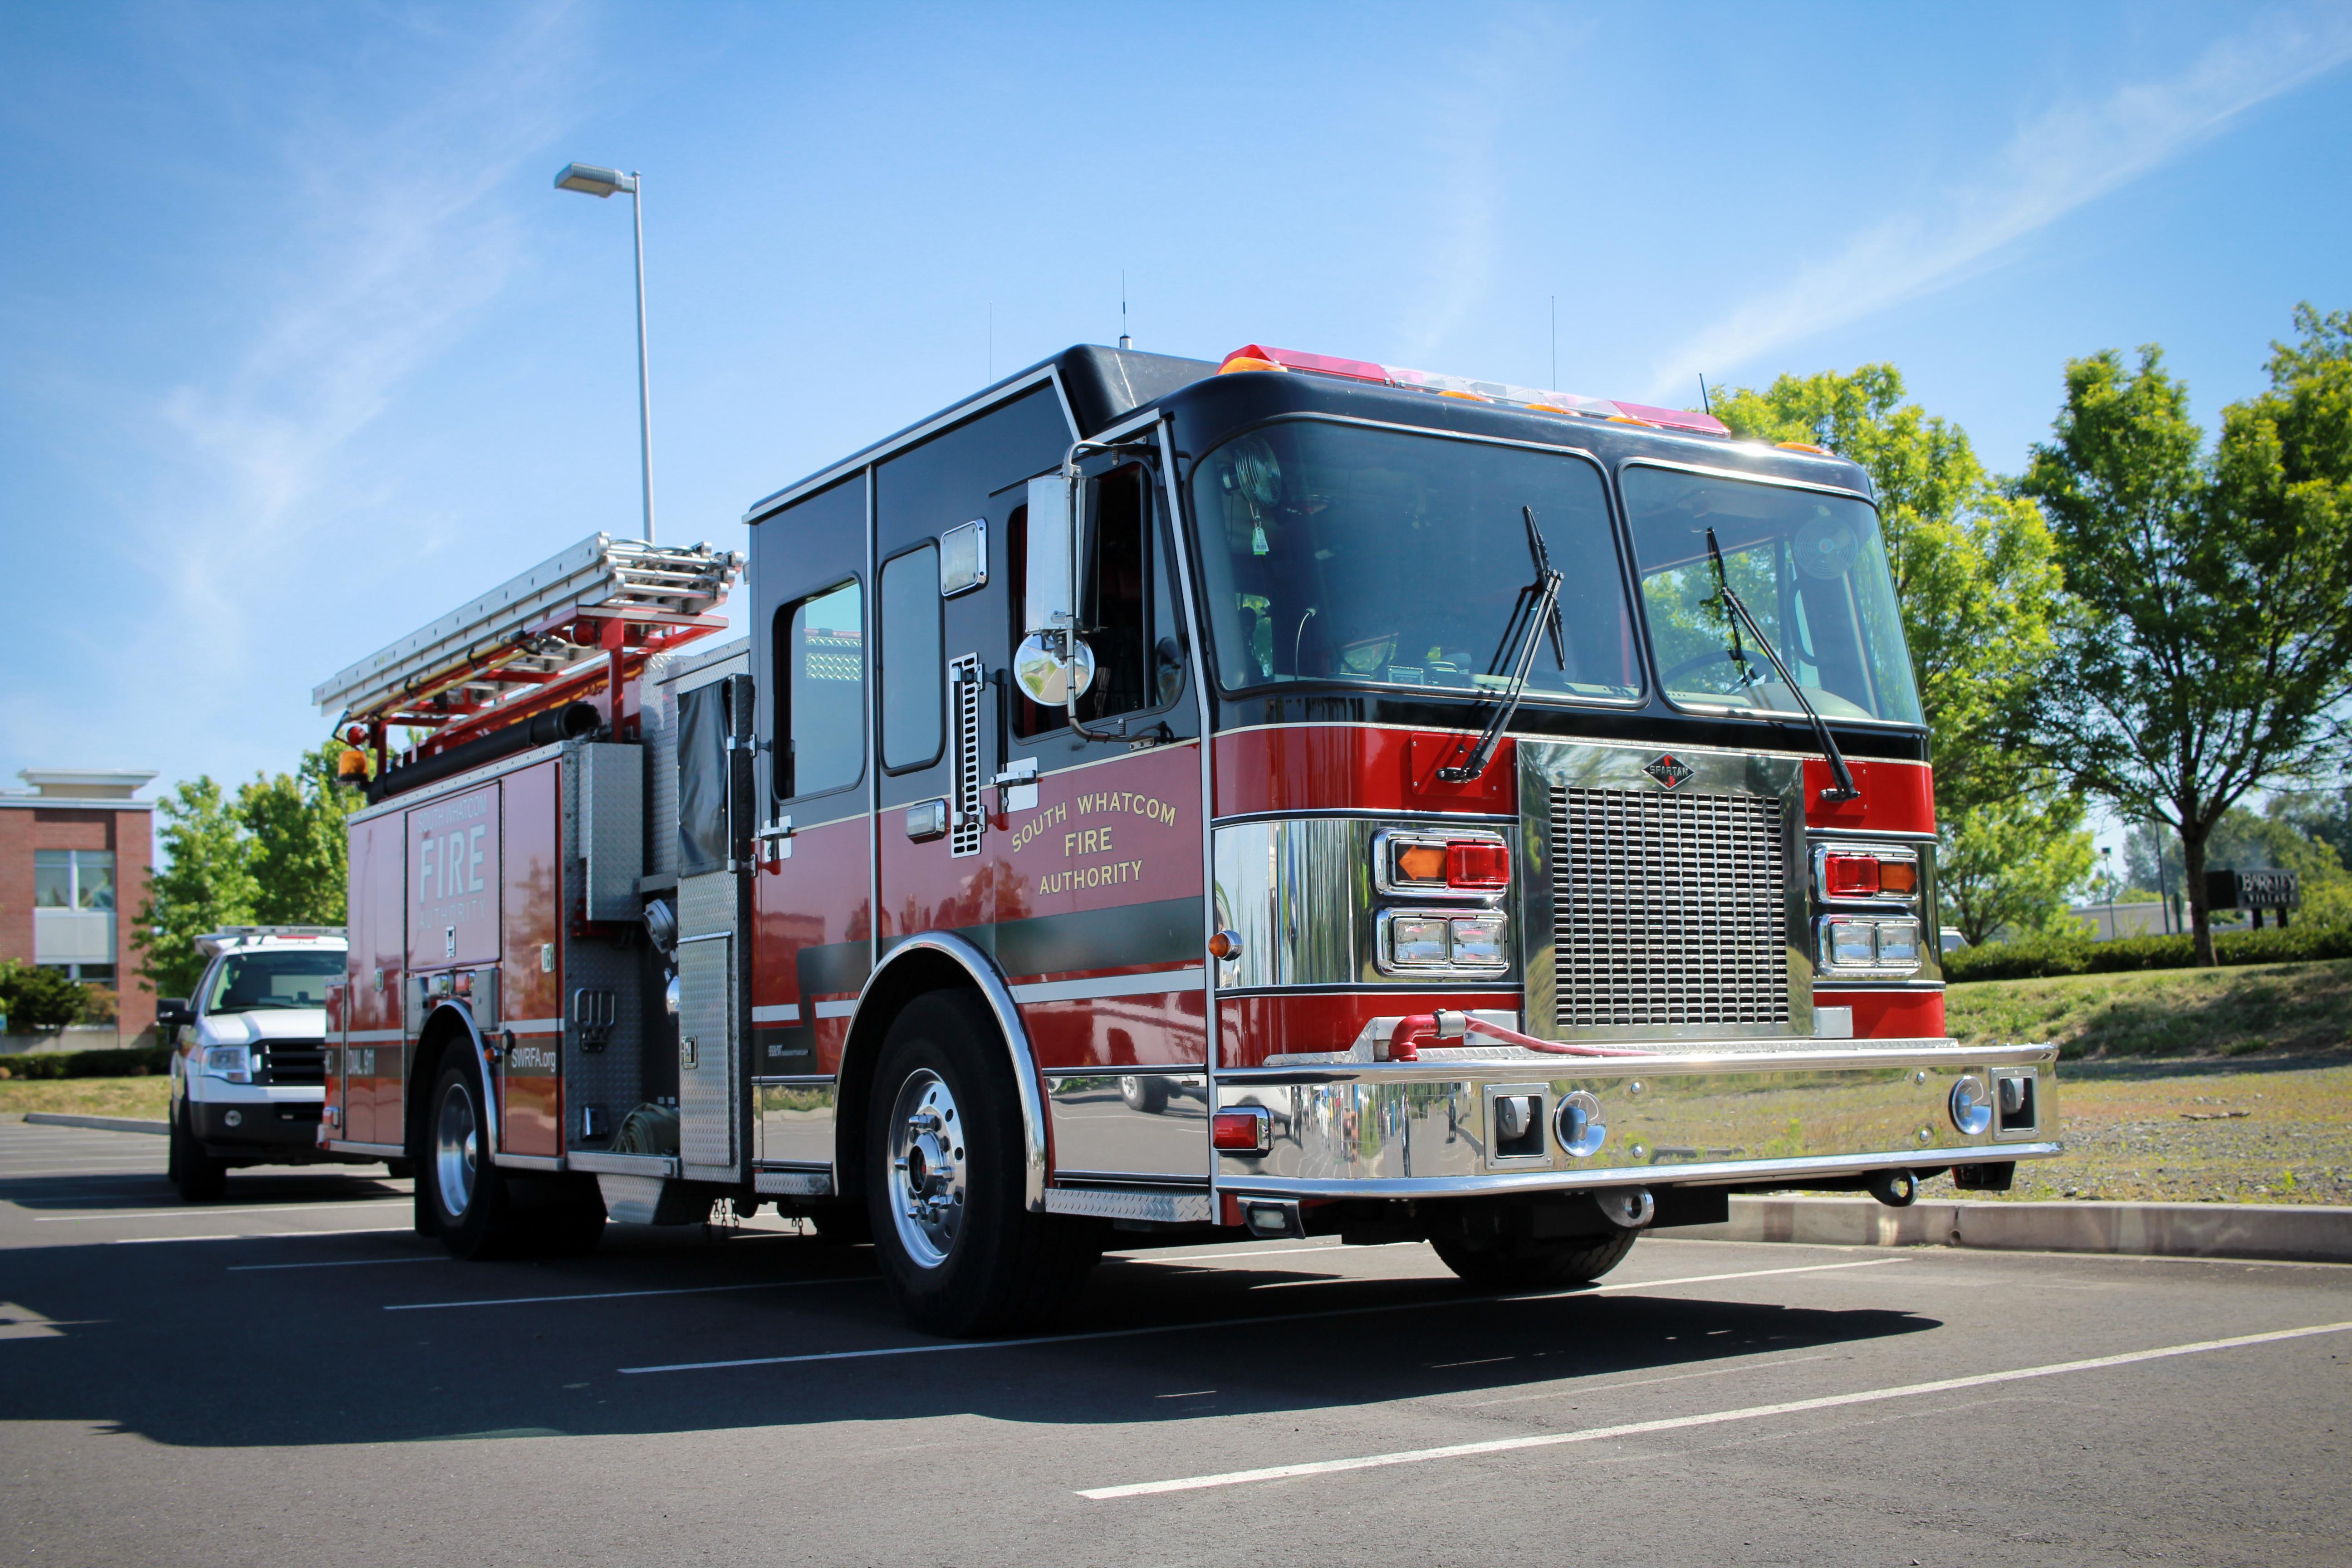 South whatcom fire authority engine photo